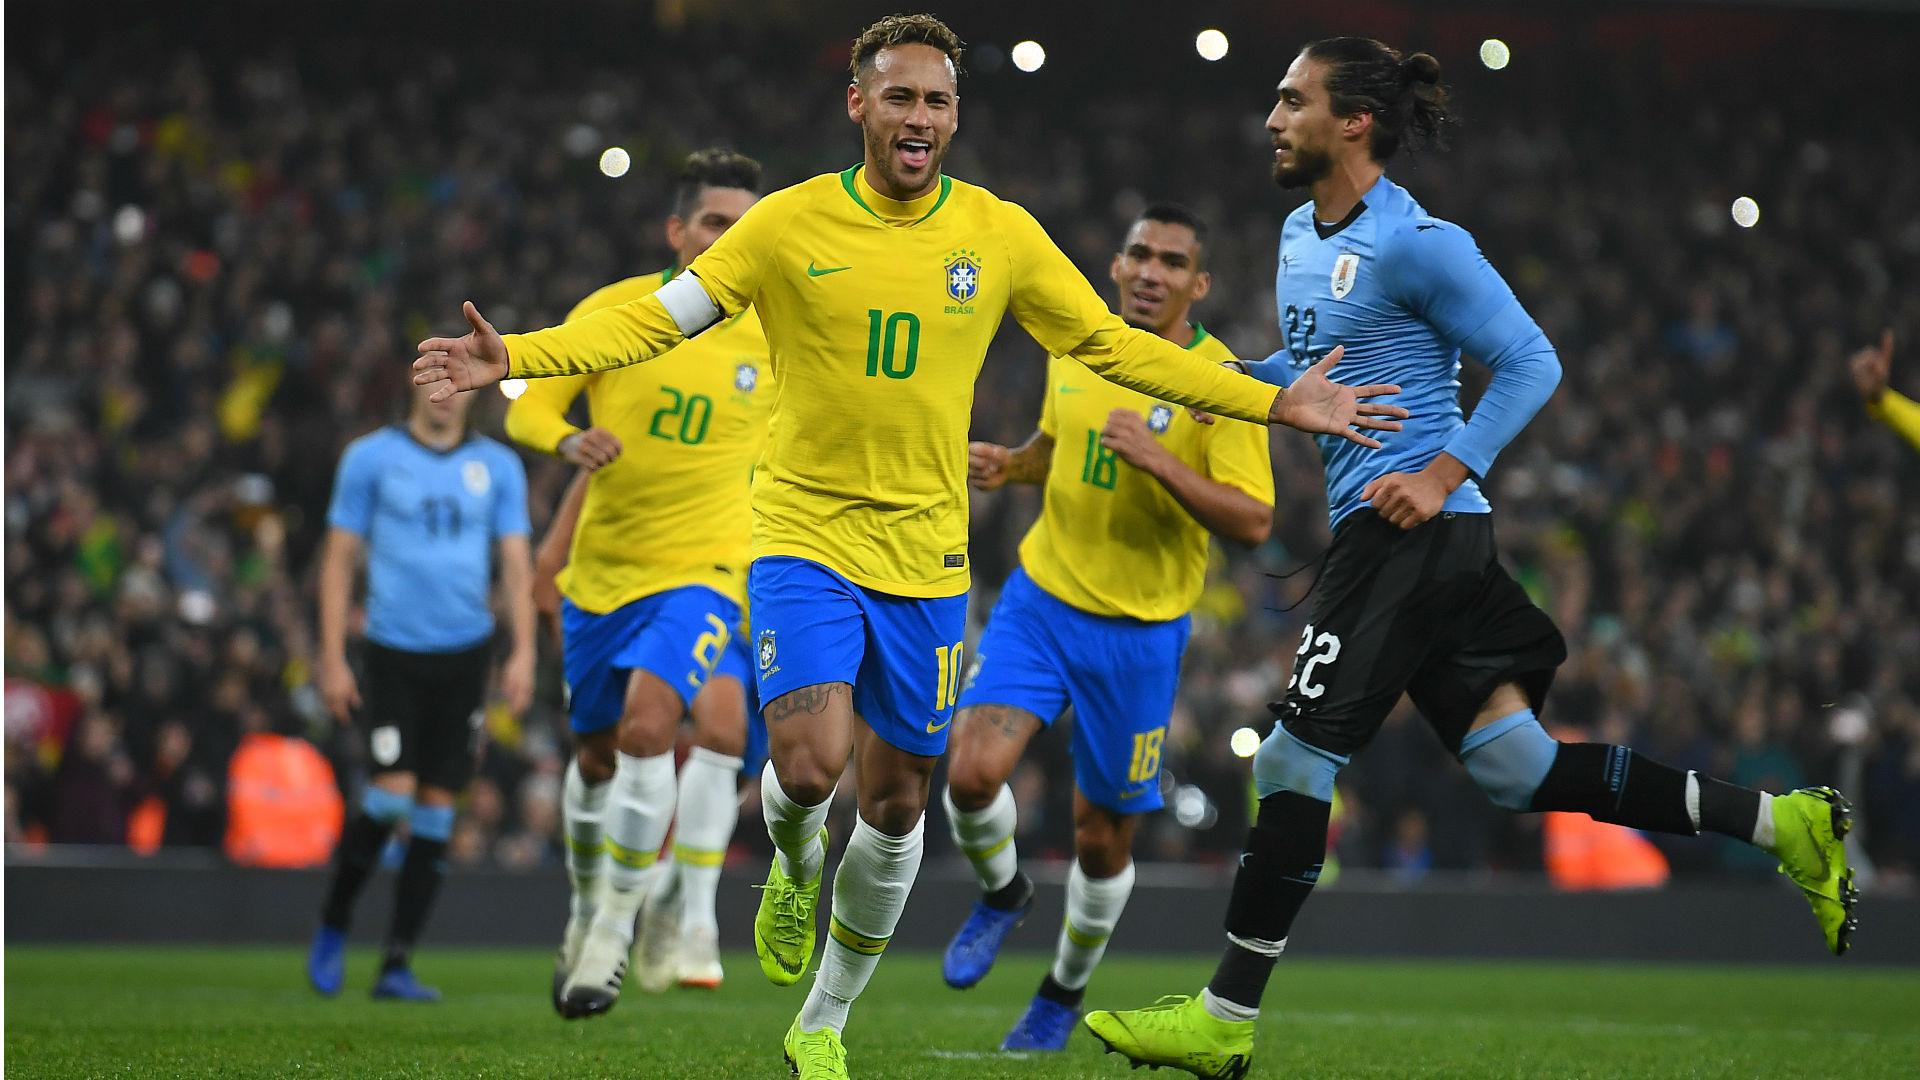 Brazil captain Neymar pleased with stern Uruguay test